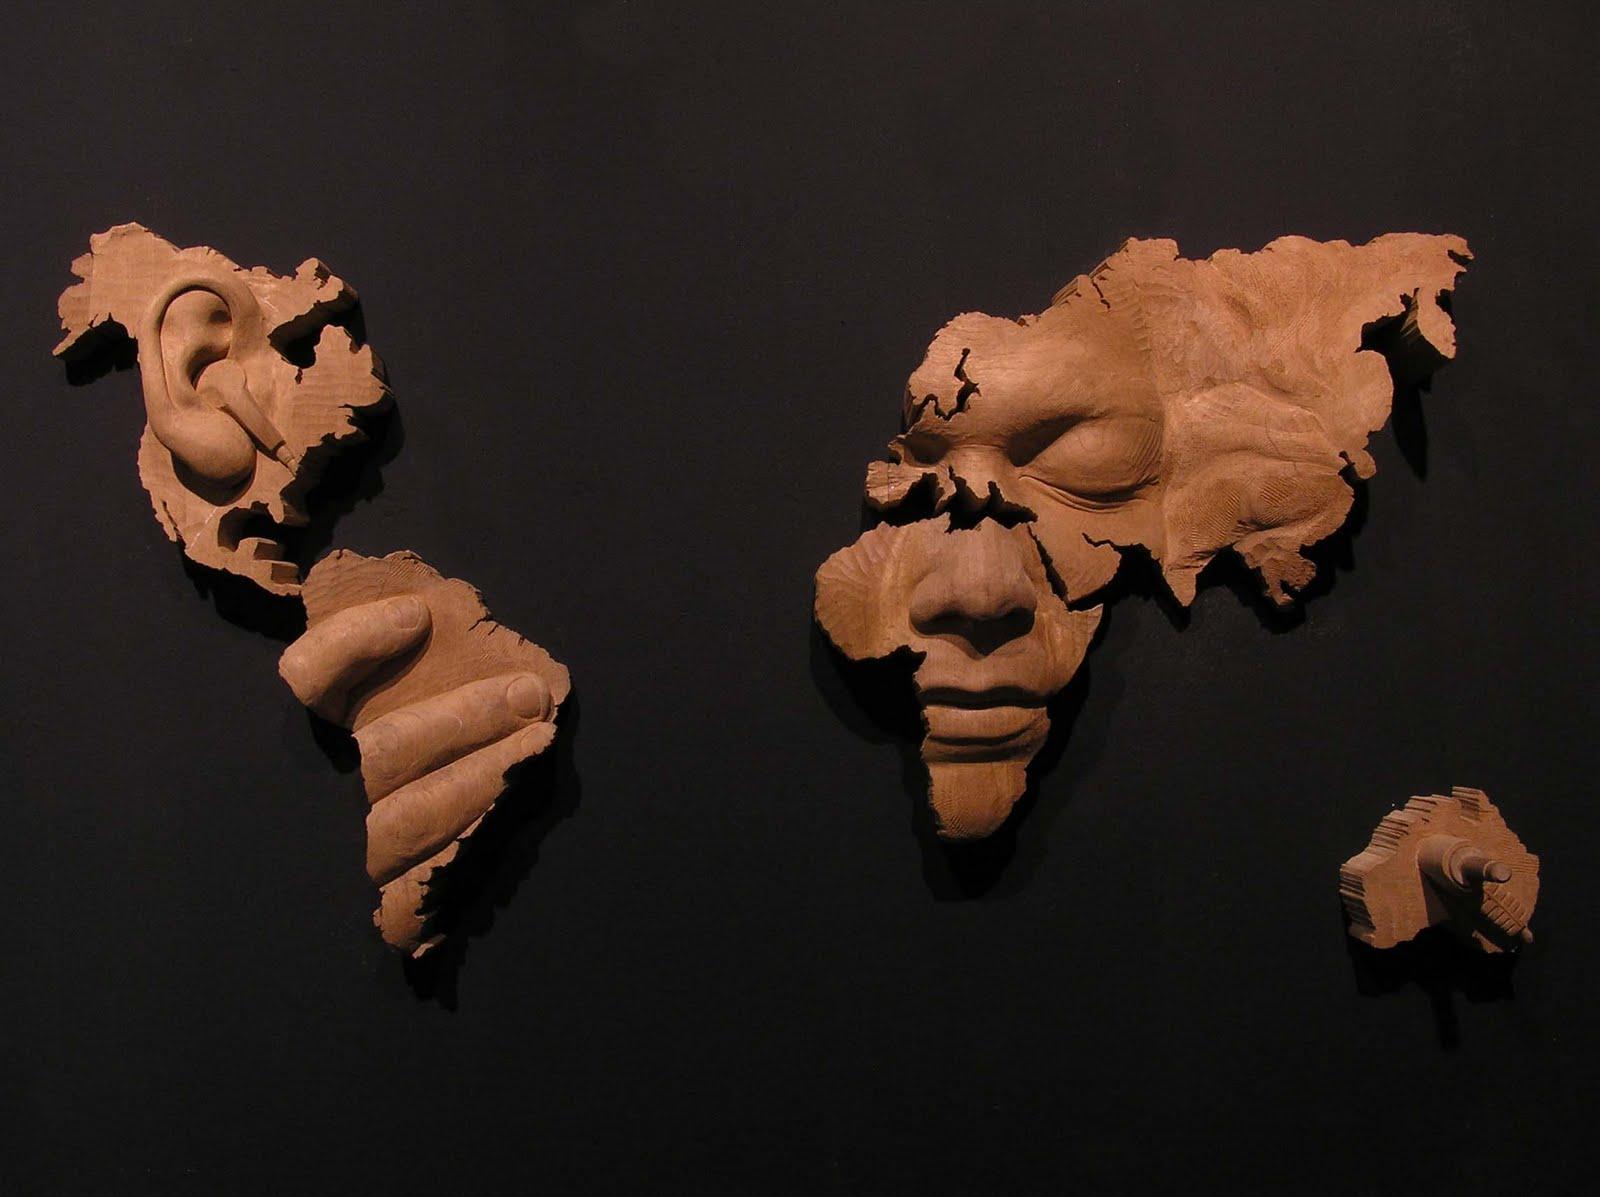 Humano, demasiado humano II, 2006. Madera de cedro 85 x 145 x 24 cm